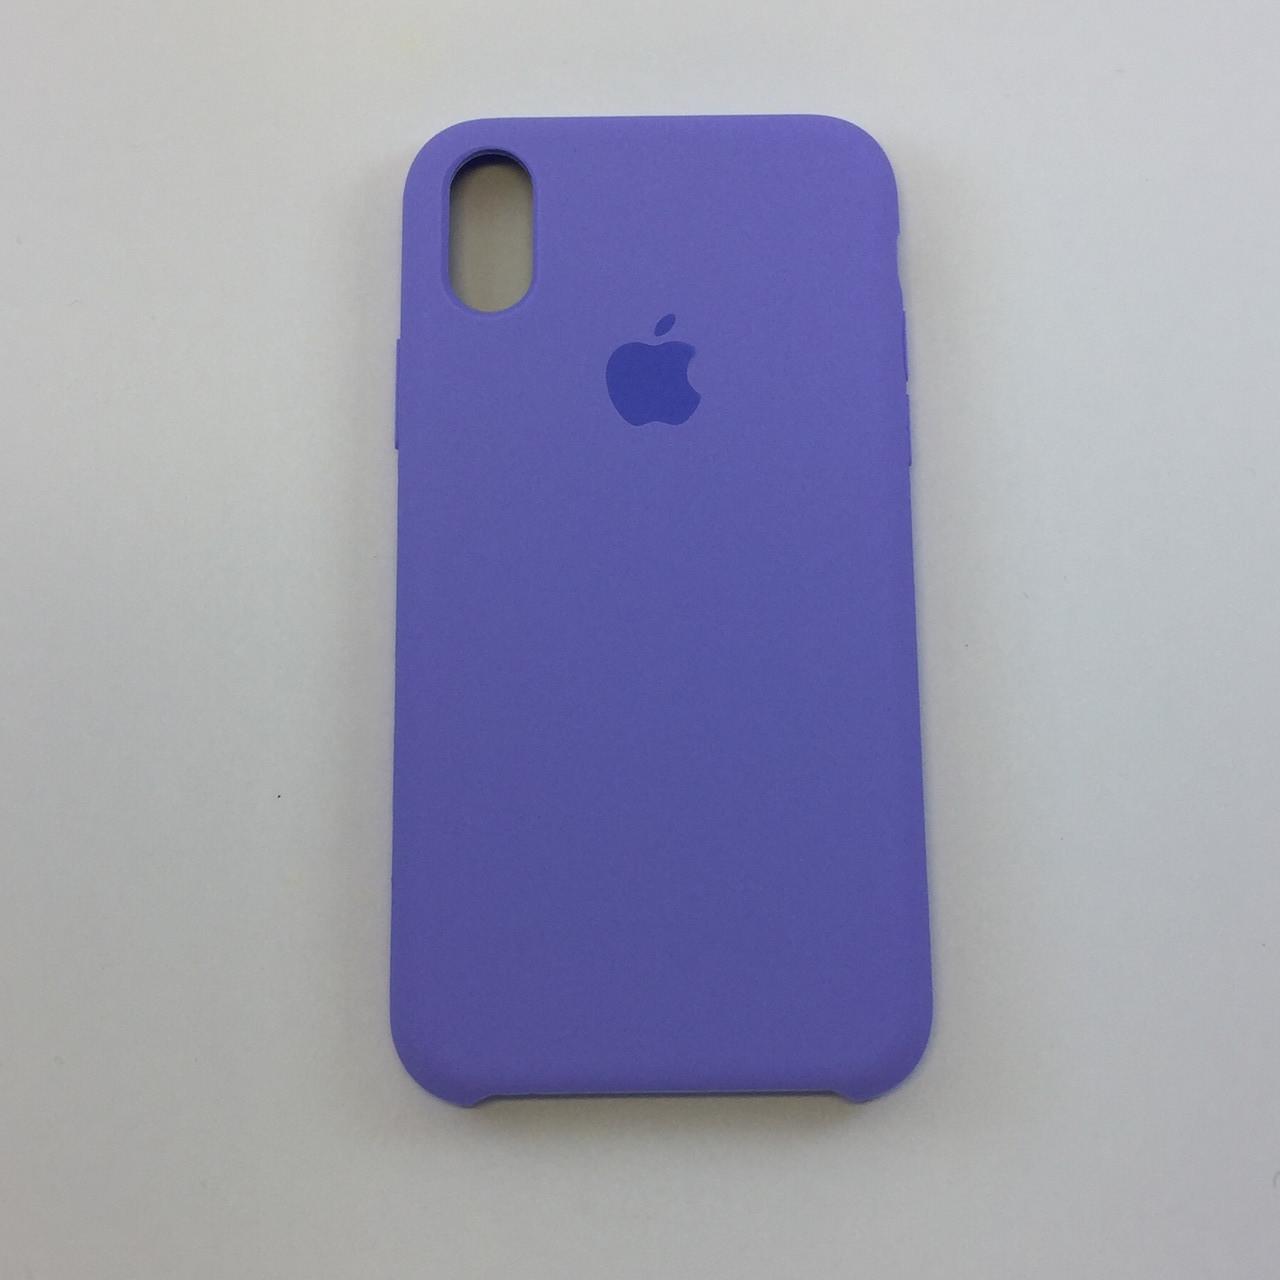 "Чехол - Silicon Case для iPhone ""Сирень - №41"" - copy orig., фото 1"